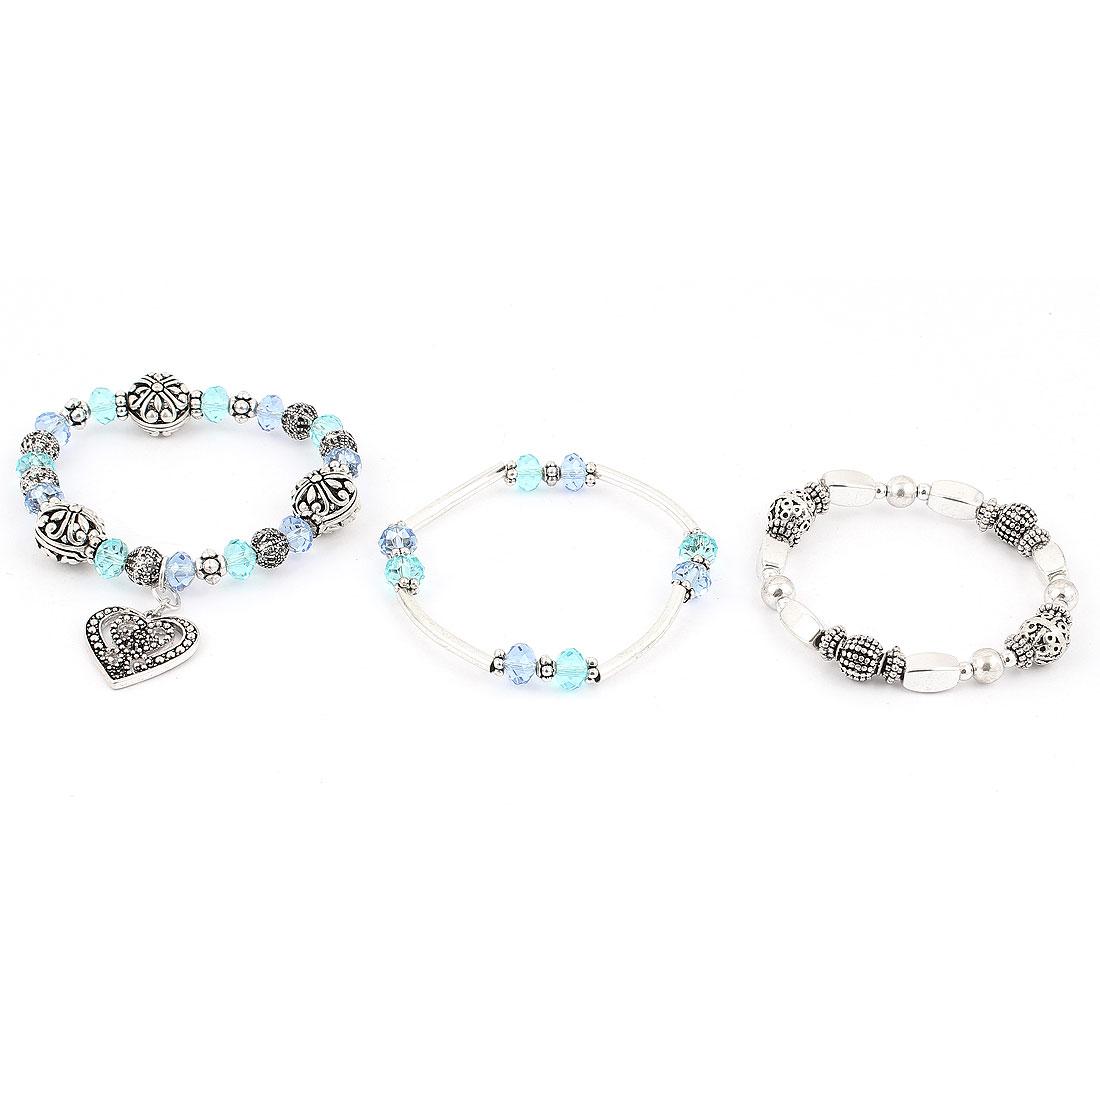 Unisex Plastic Crystals Elastic Band Wrist Decor Bracelets Bangle Tricolor 3pcs